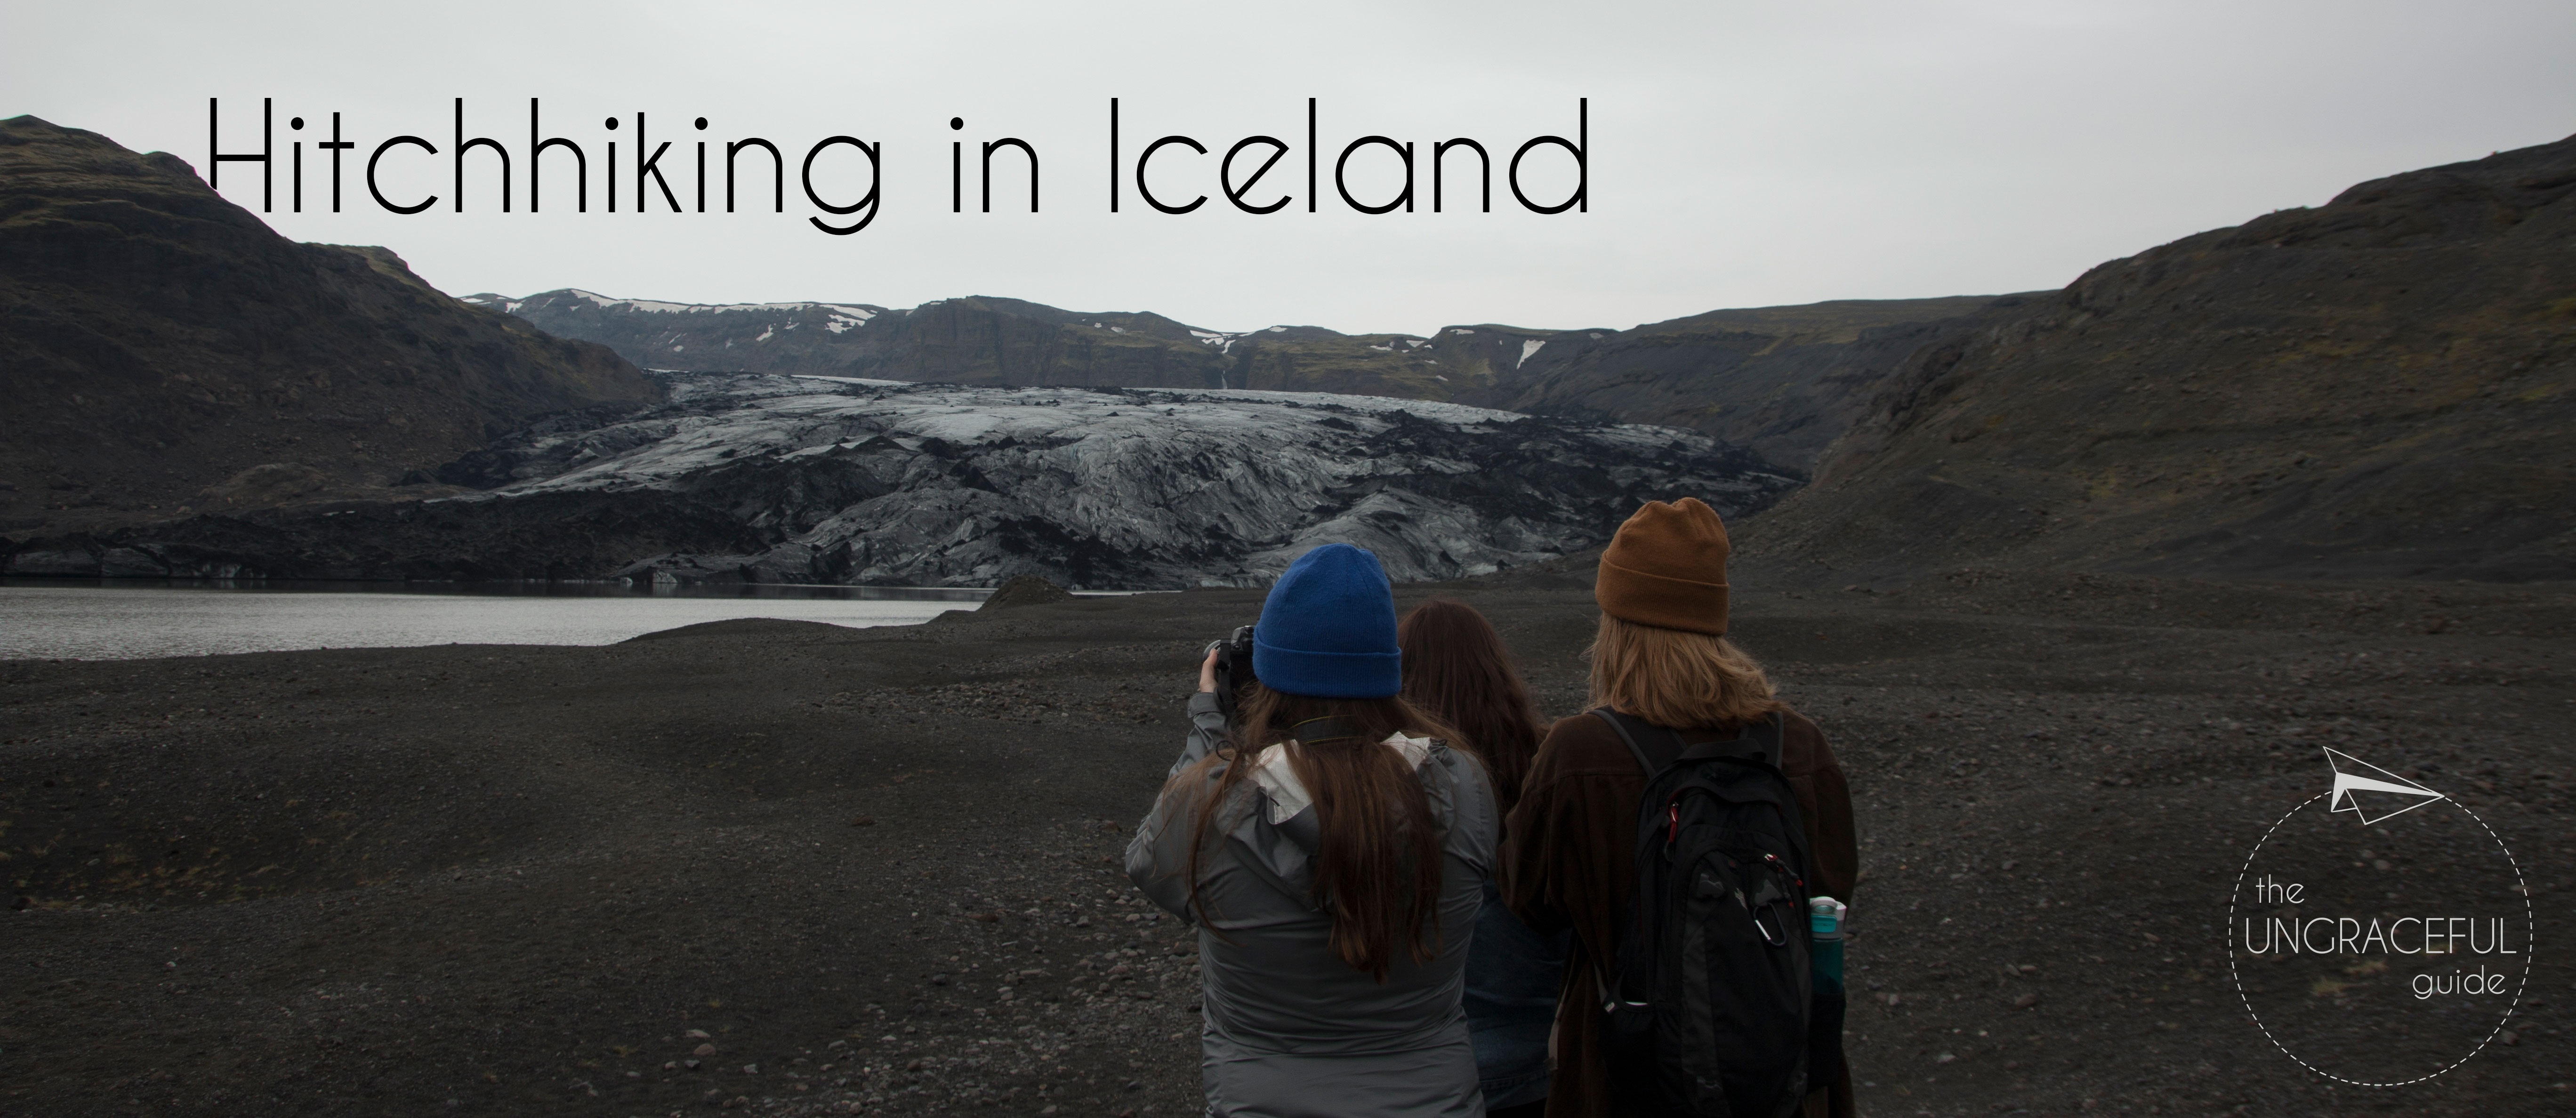 "<img src=""data:image/gif;base64,R0lGODdhAQABAPAAAP///wAAACwAAAAAAQABAEACAkQBADs="" data-lazy-src=""images/"" width=""800"" height=""600"" alt=""iceland - hitchhikinh - Iceland: How to get the most on a budget"">"